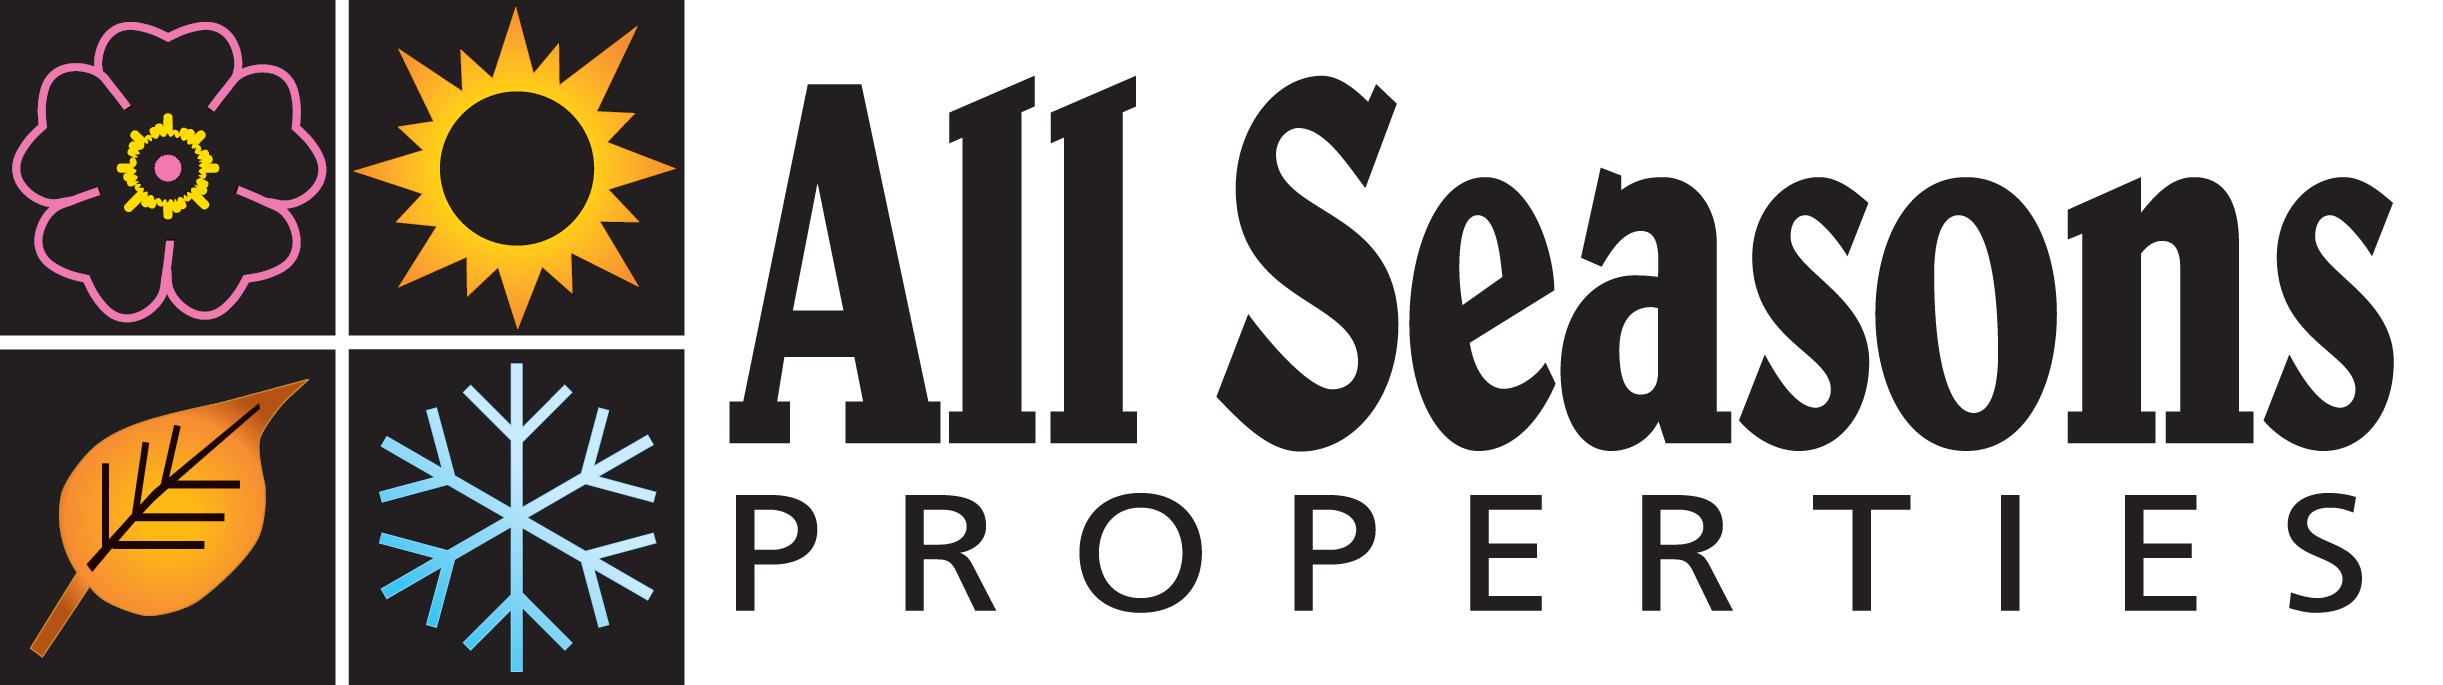 All Seasons Properties logo (image)